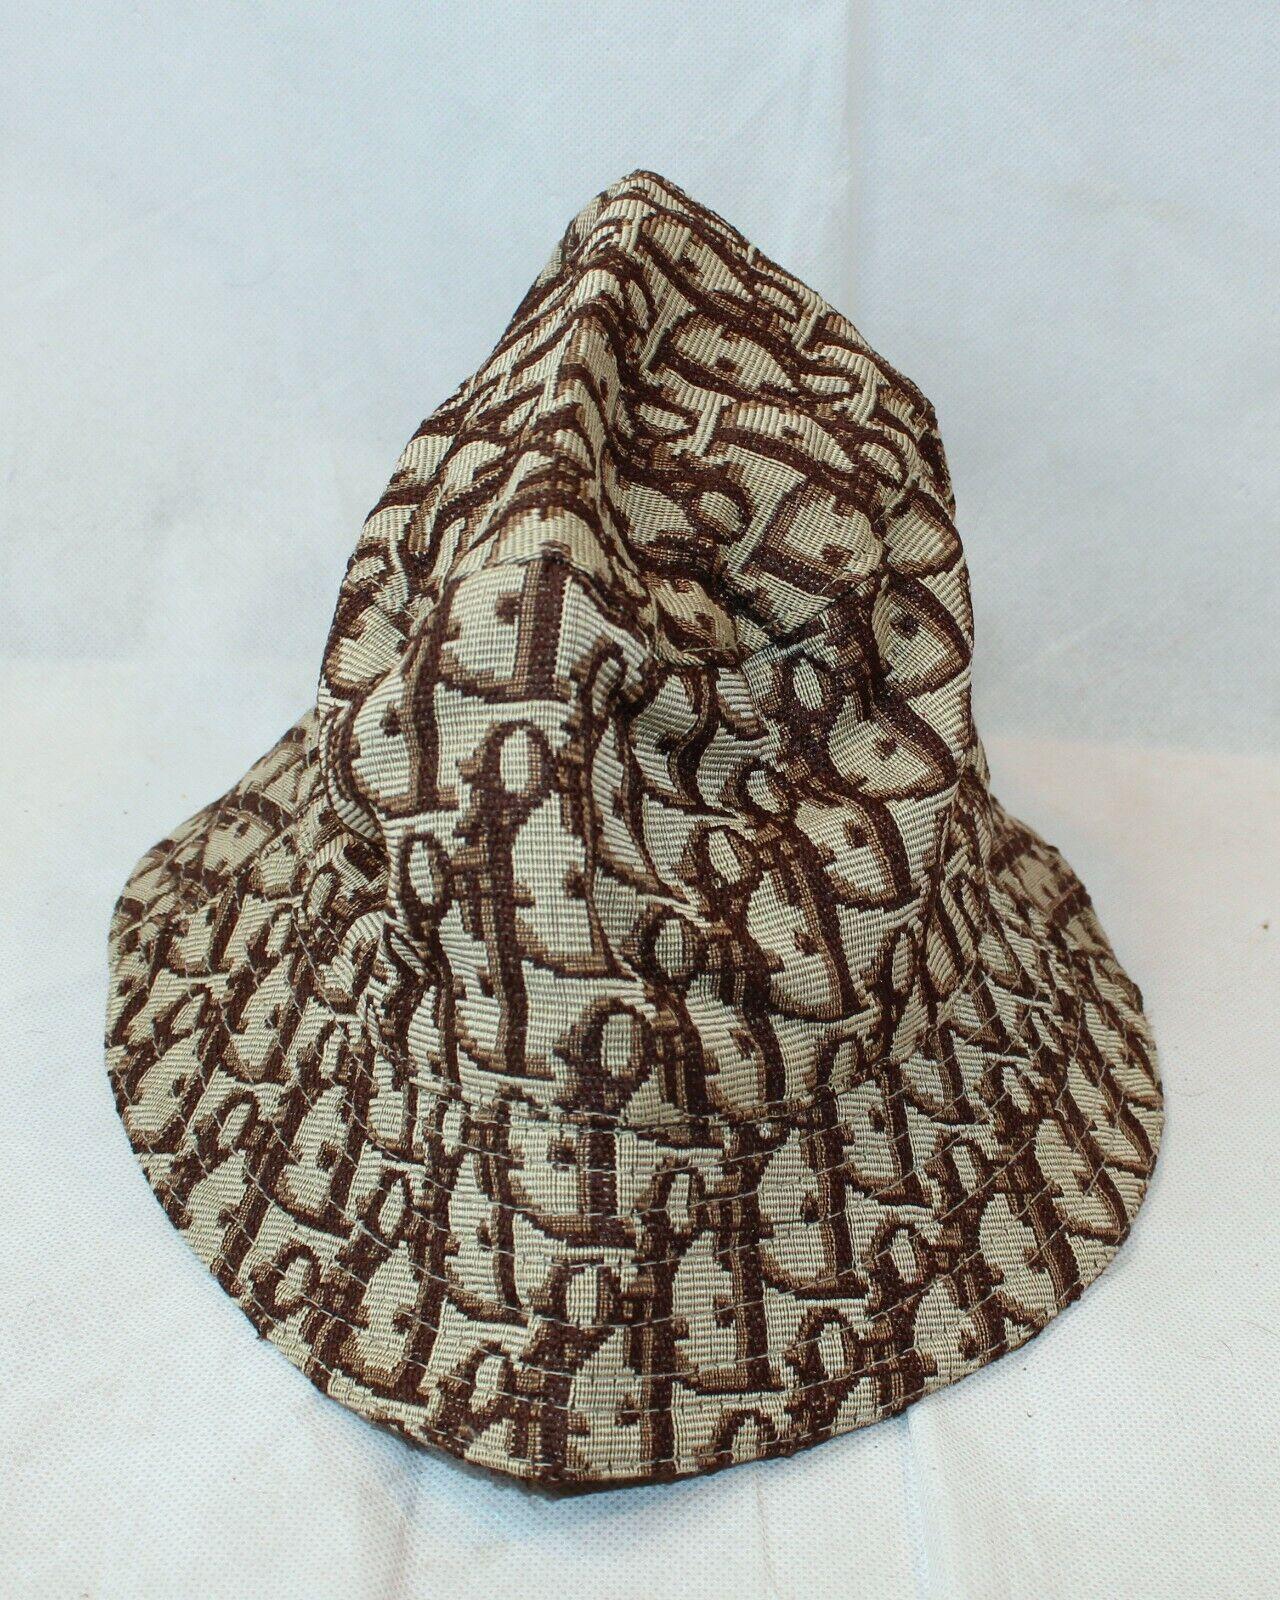 Dior Bucket Hat Small/Medium - image 2